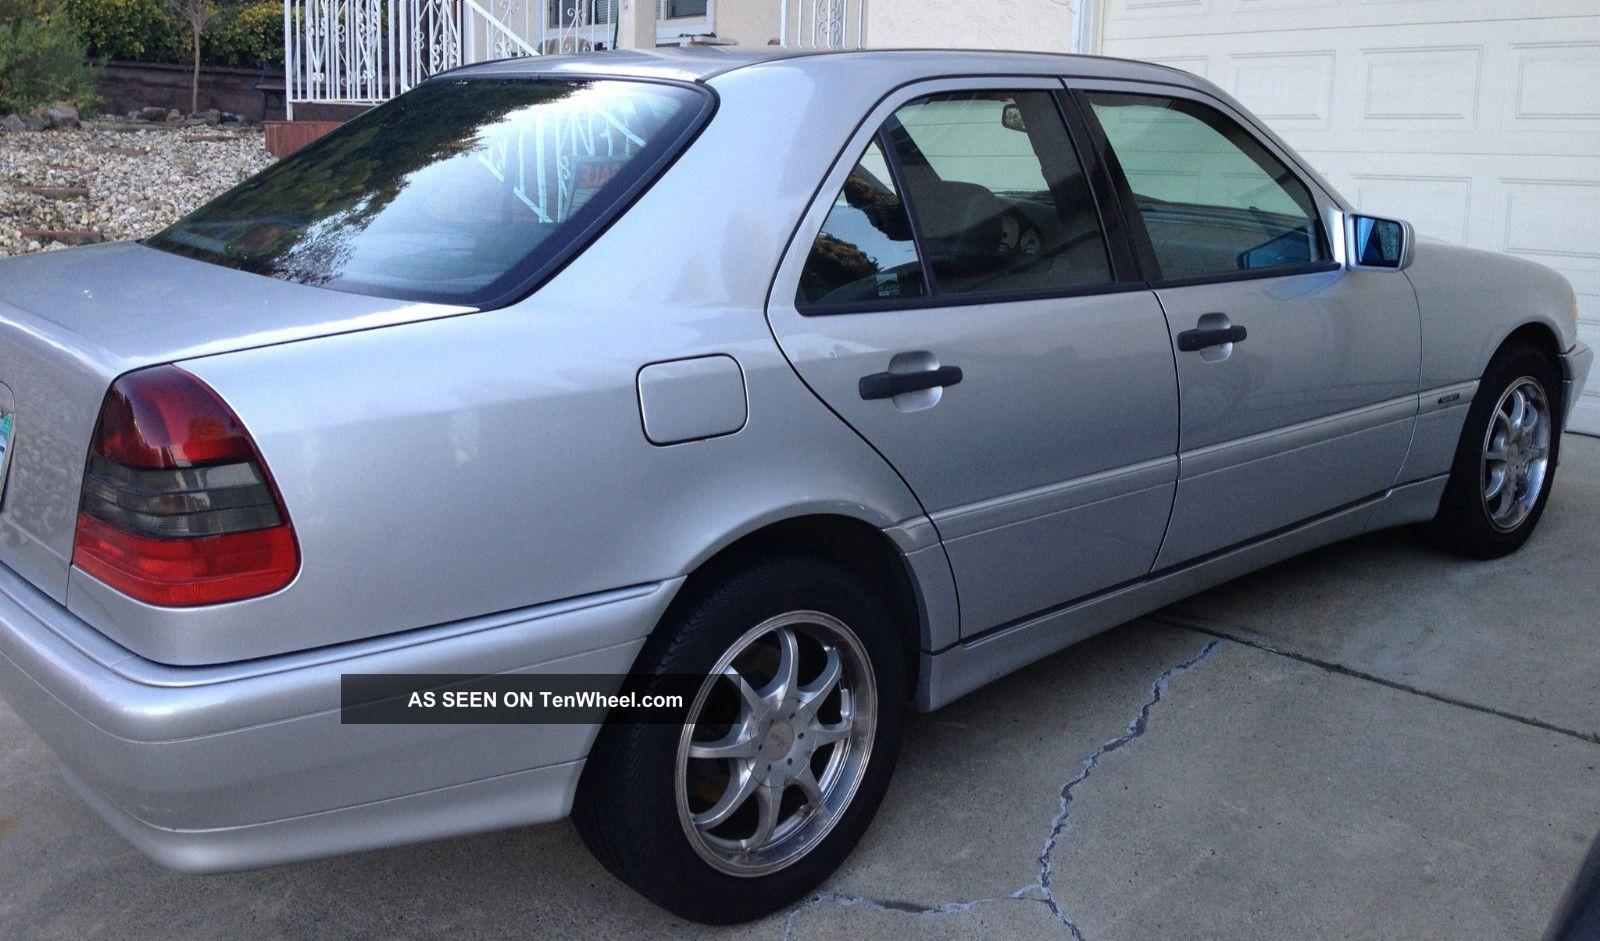 1999 silver mercedes benz c280 c class sedan for Mercedes benz c class sedan